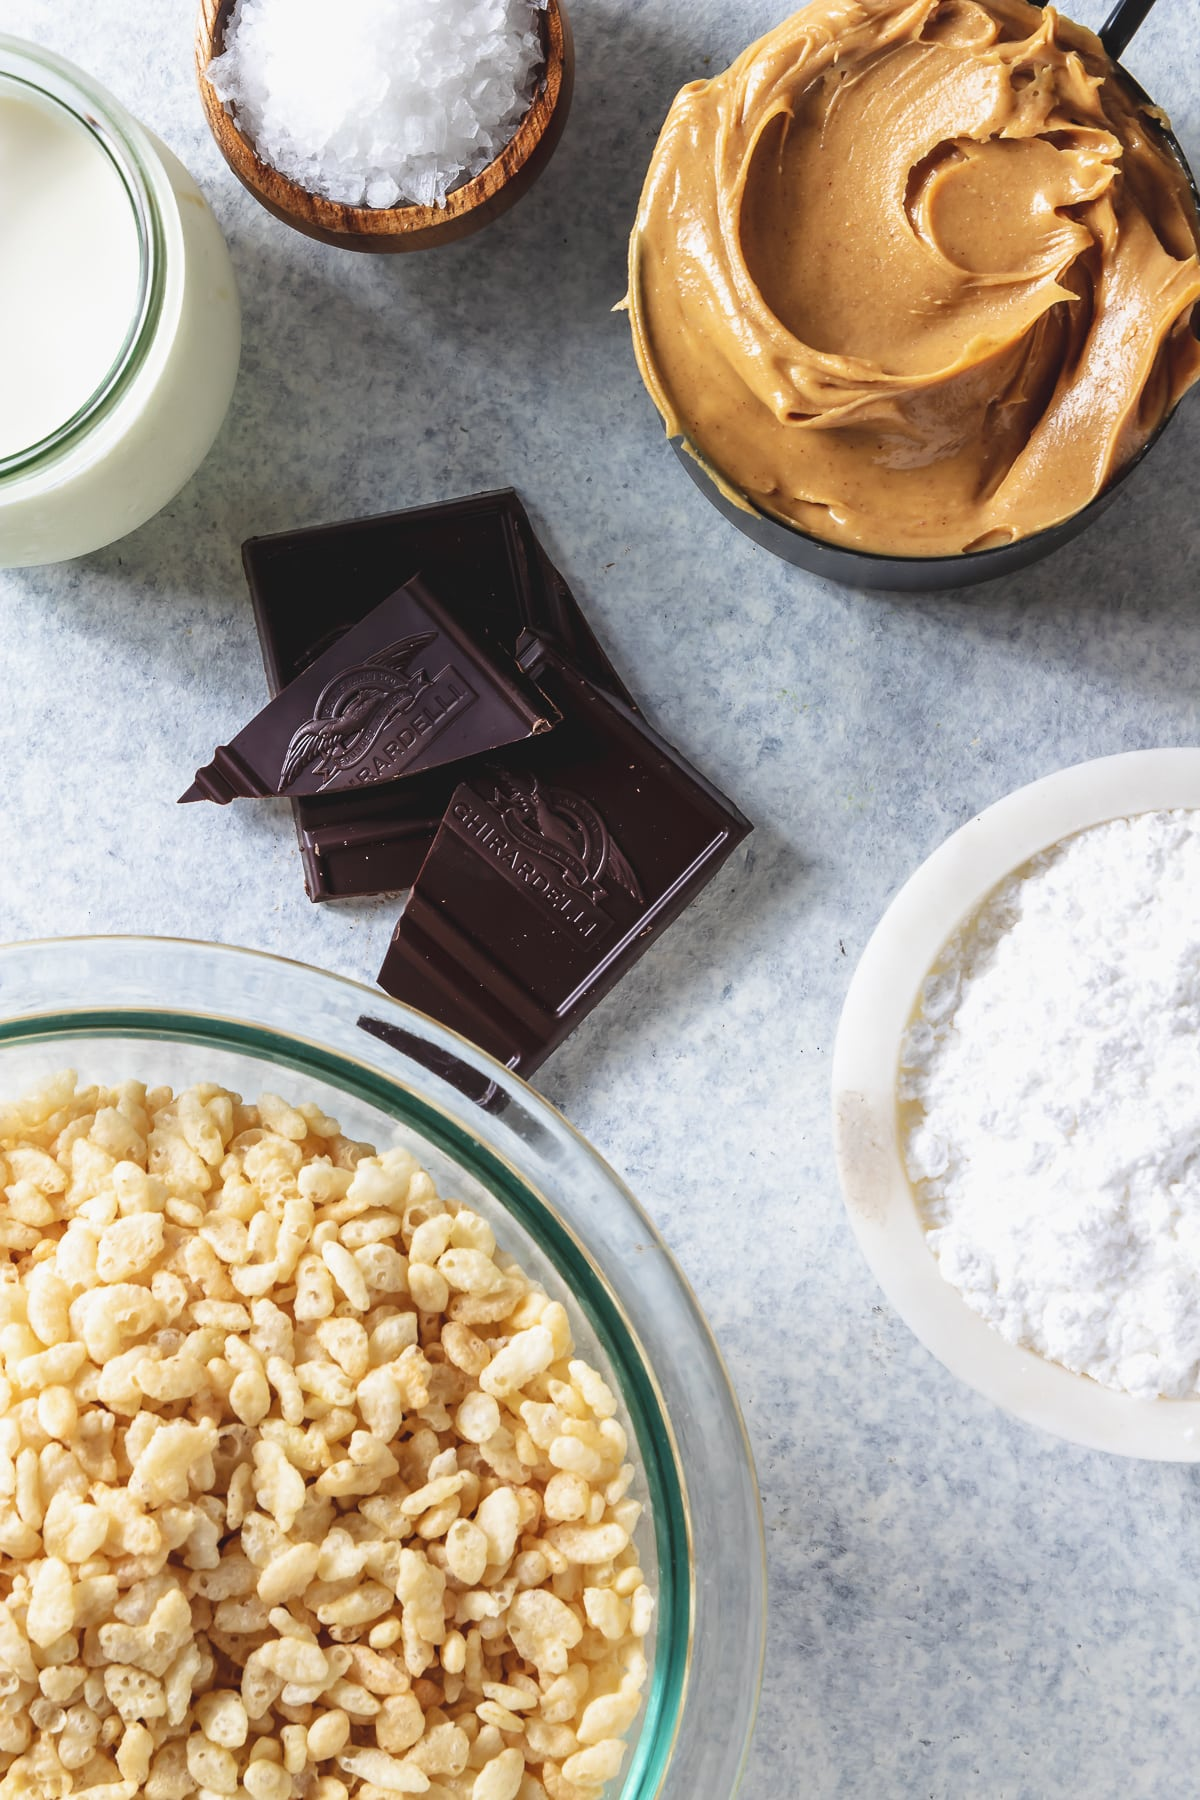 ingredients for crispy peanut butter bars